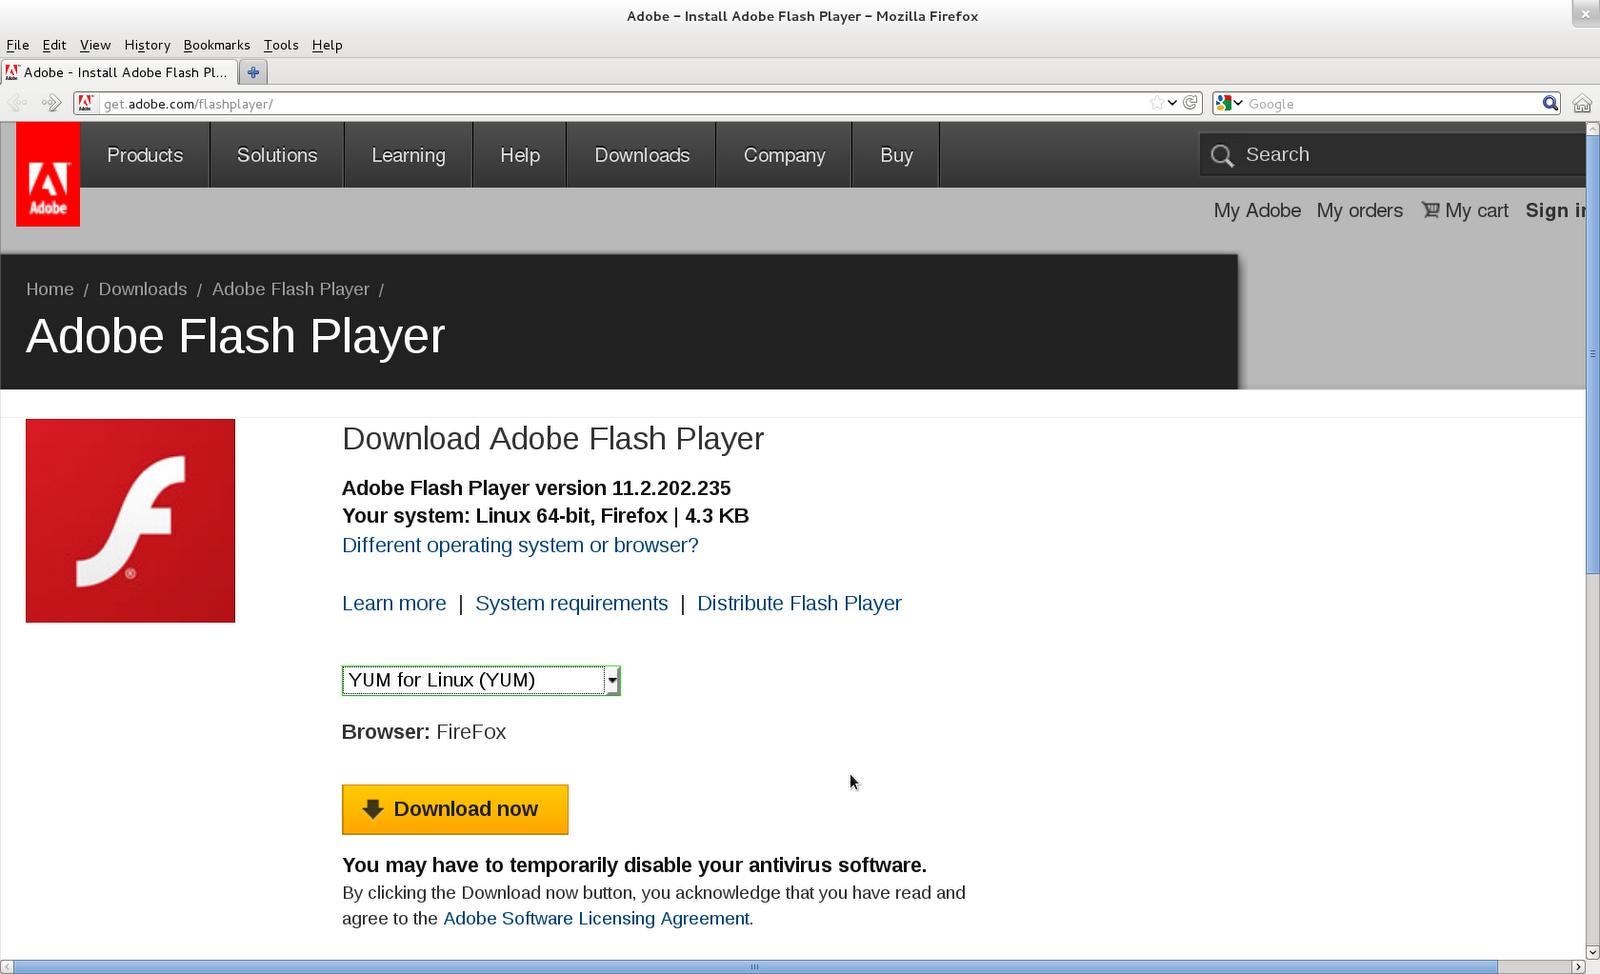 Technozeal install adobe flash player on fedora 16 Install adobe flash